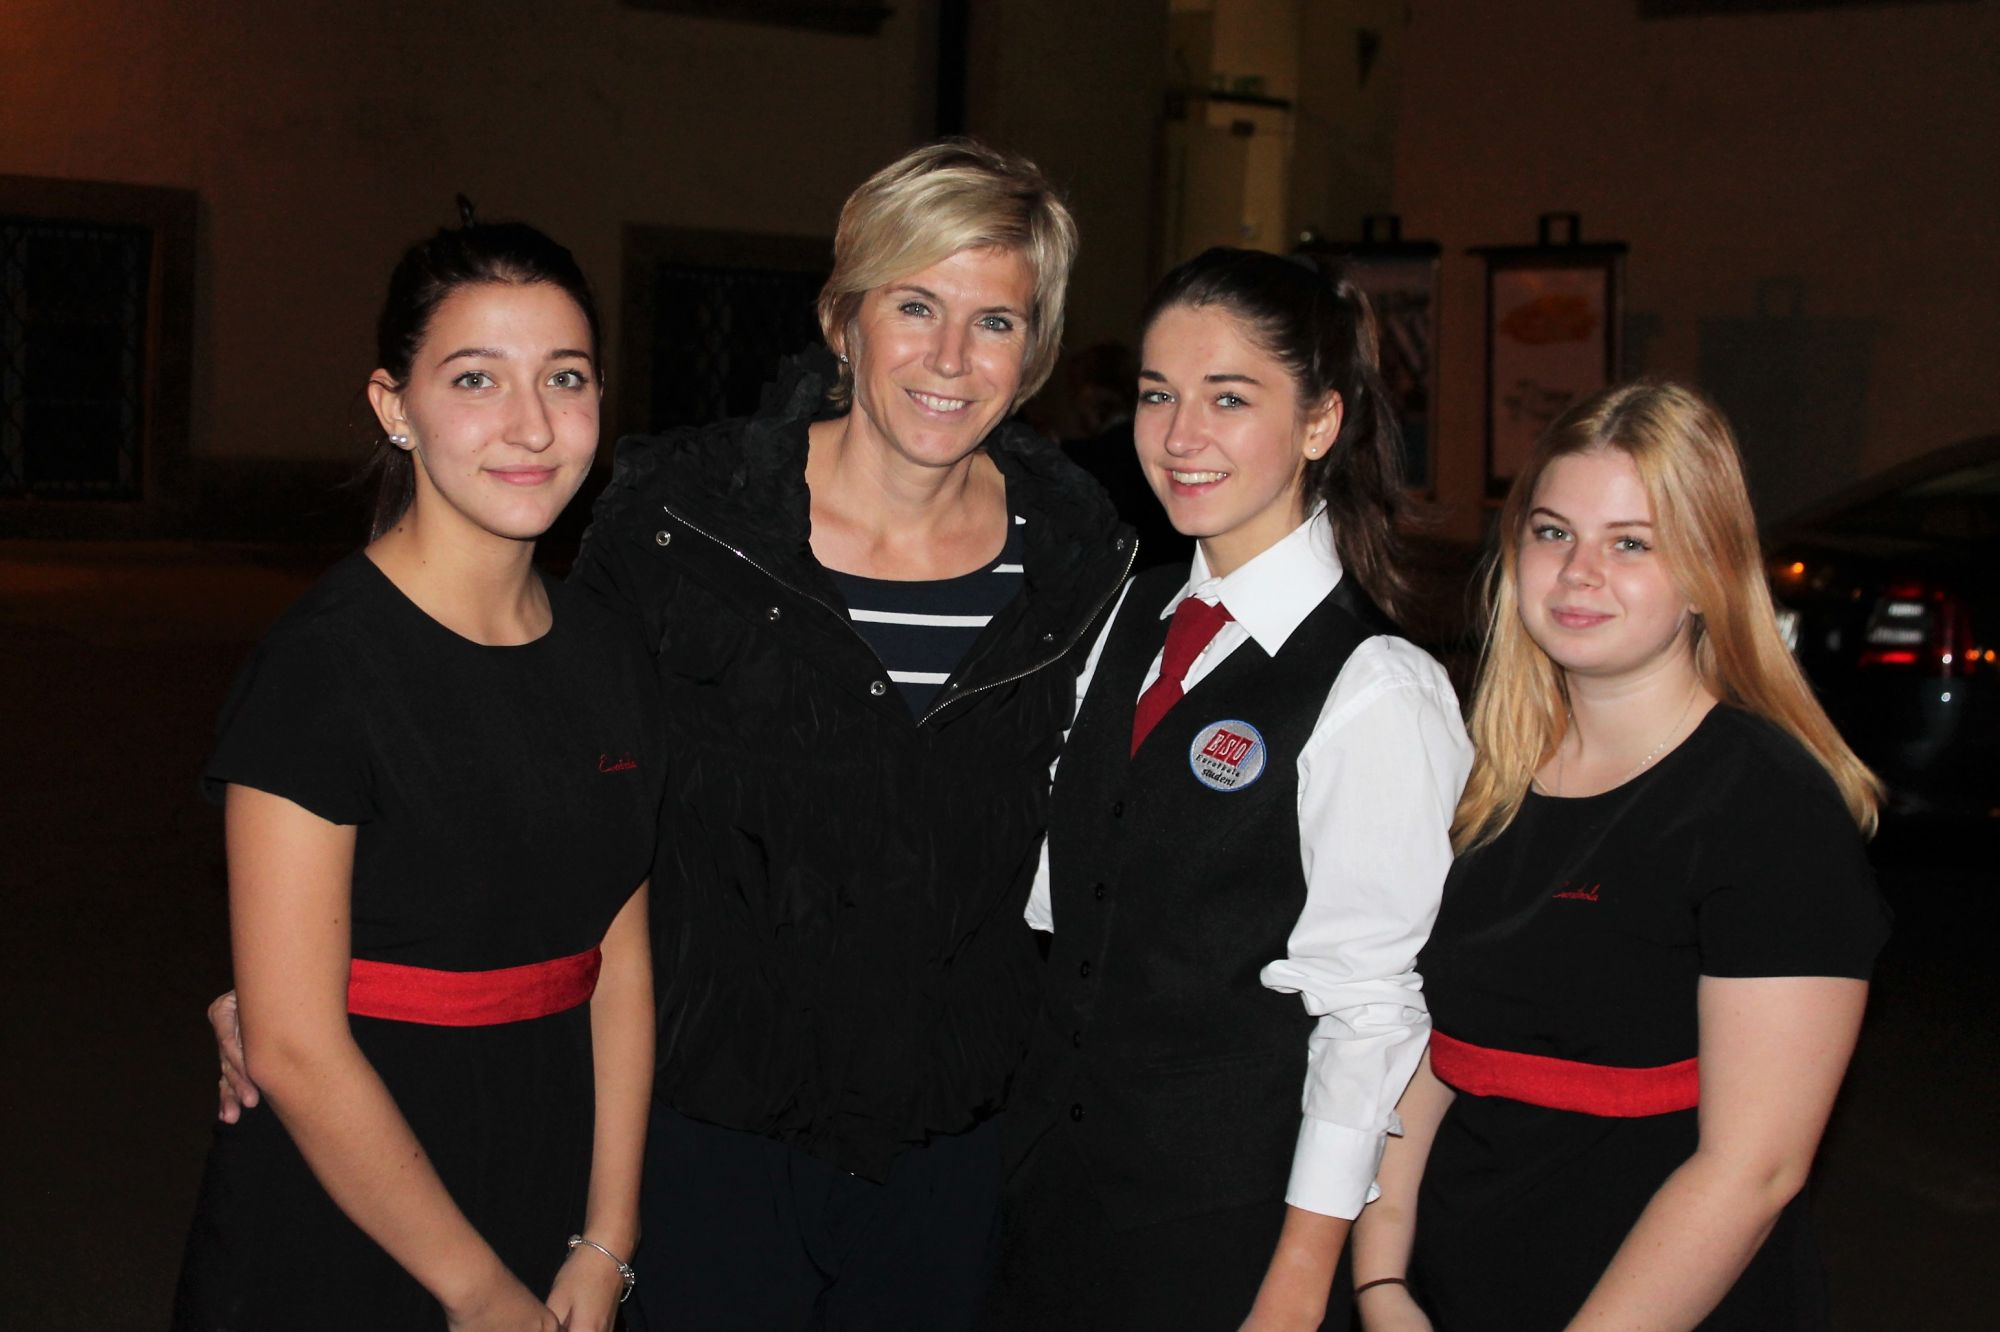 Euroškoláci v Klementinu